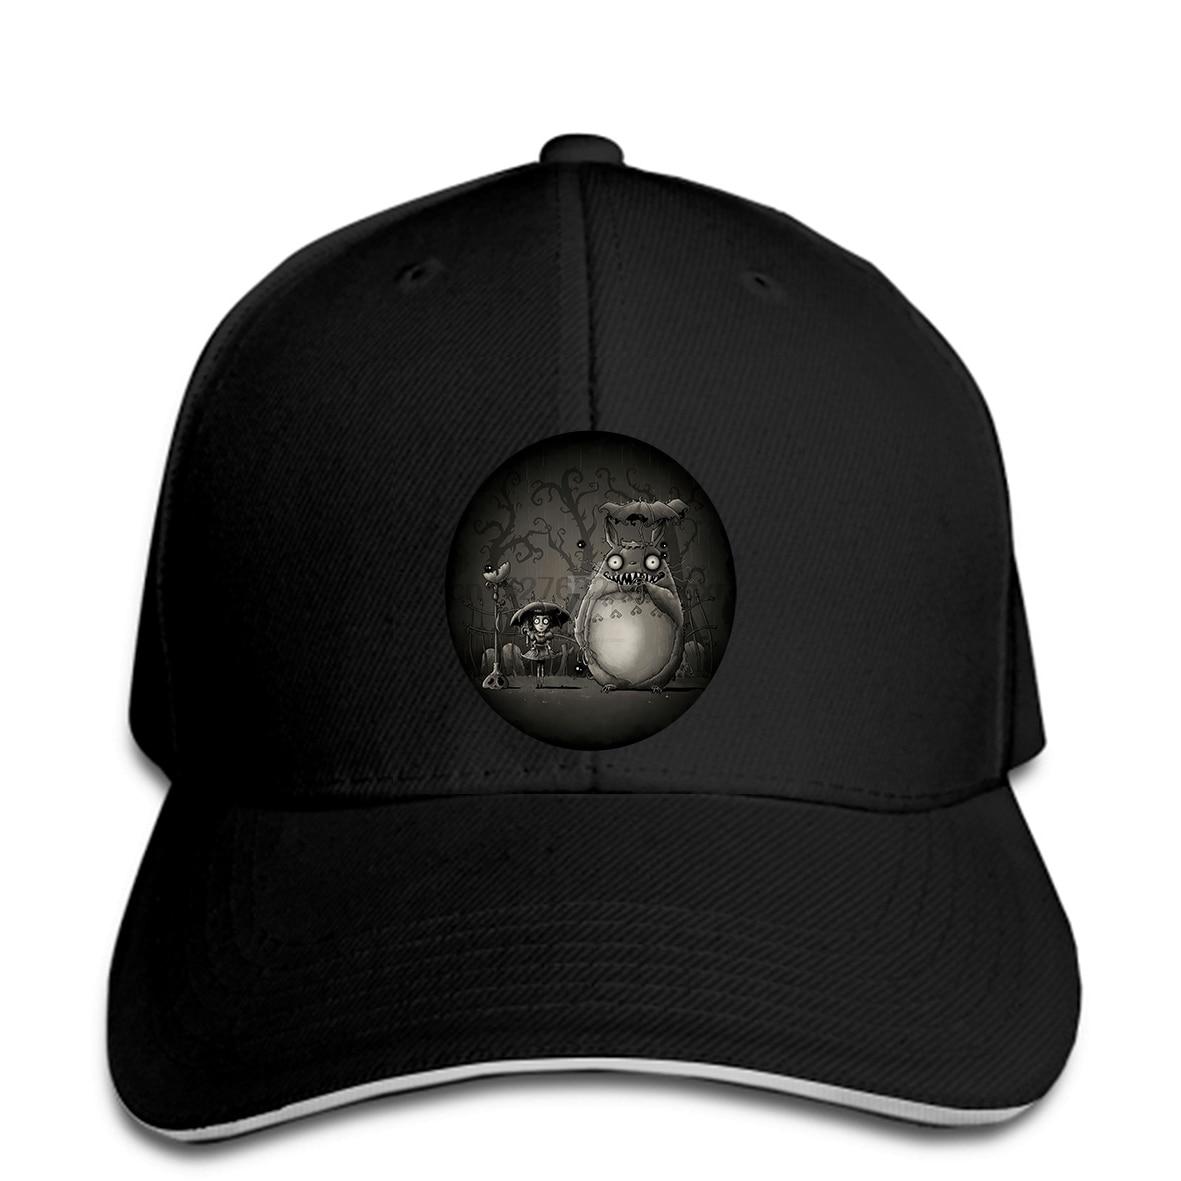 Gorra de béisbol para hombre personalizada mi espeluznante vecino Totoro Tim Lauren divertida gorra de béisbol para niños novedad t women1